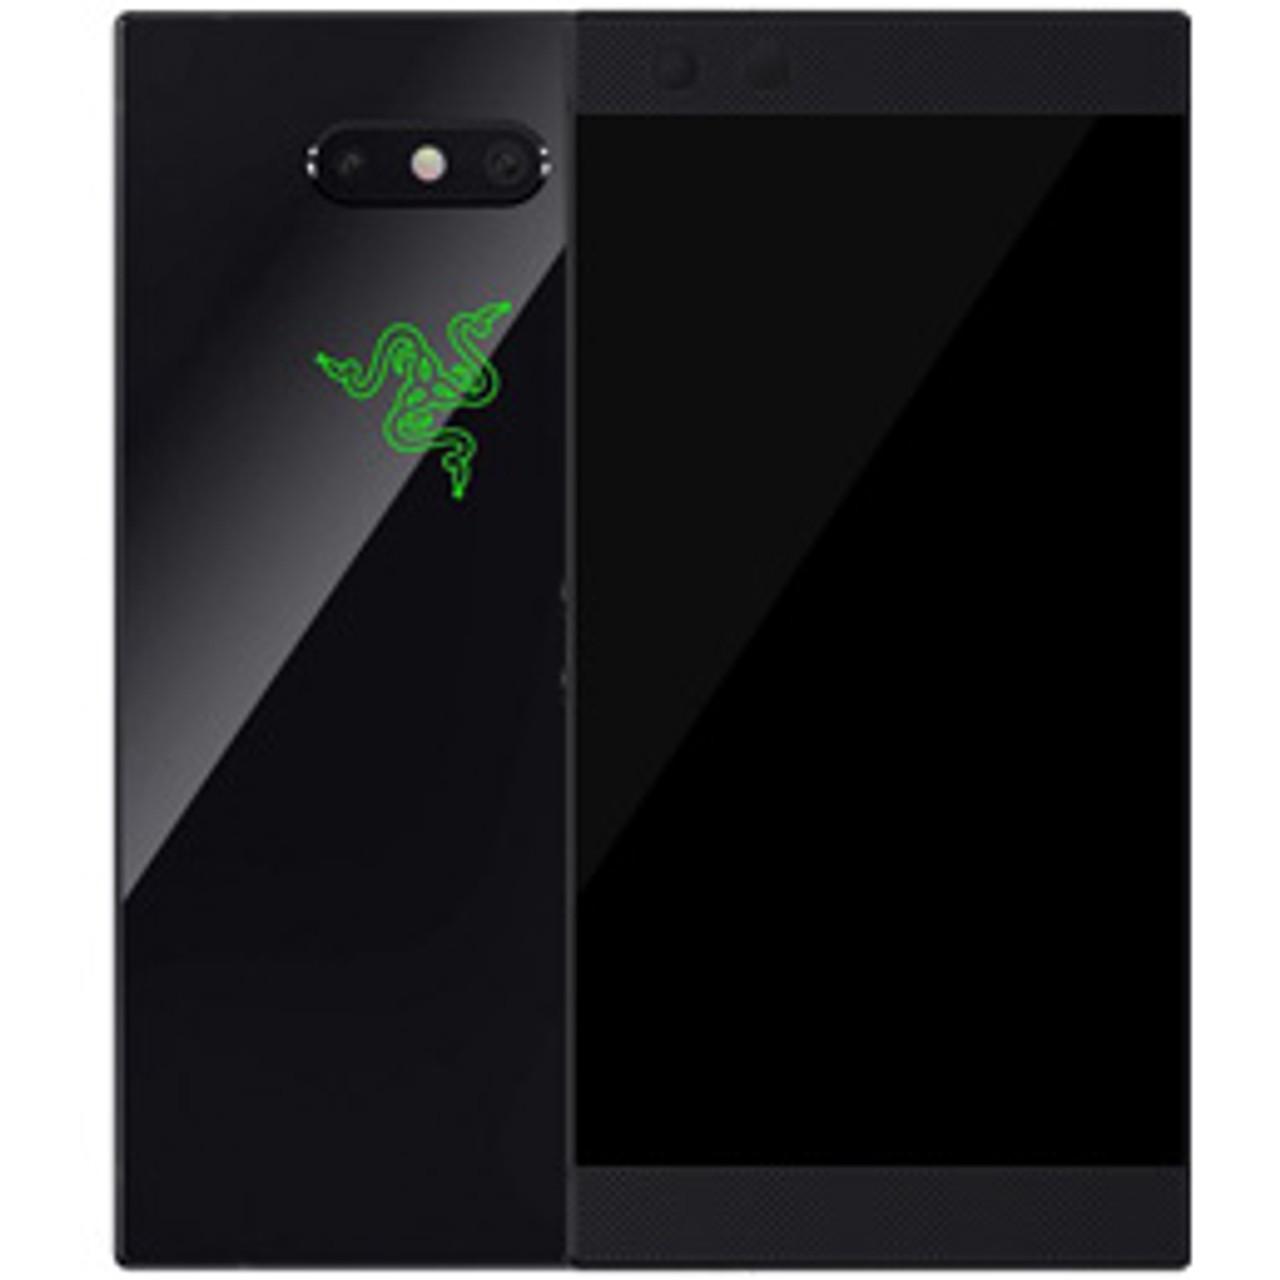 Razer Phone 2 Self Healing Screen Protection And Full Body Skins By Phantomskinz